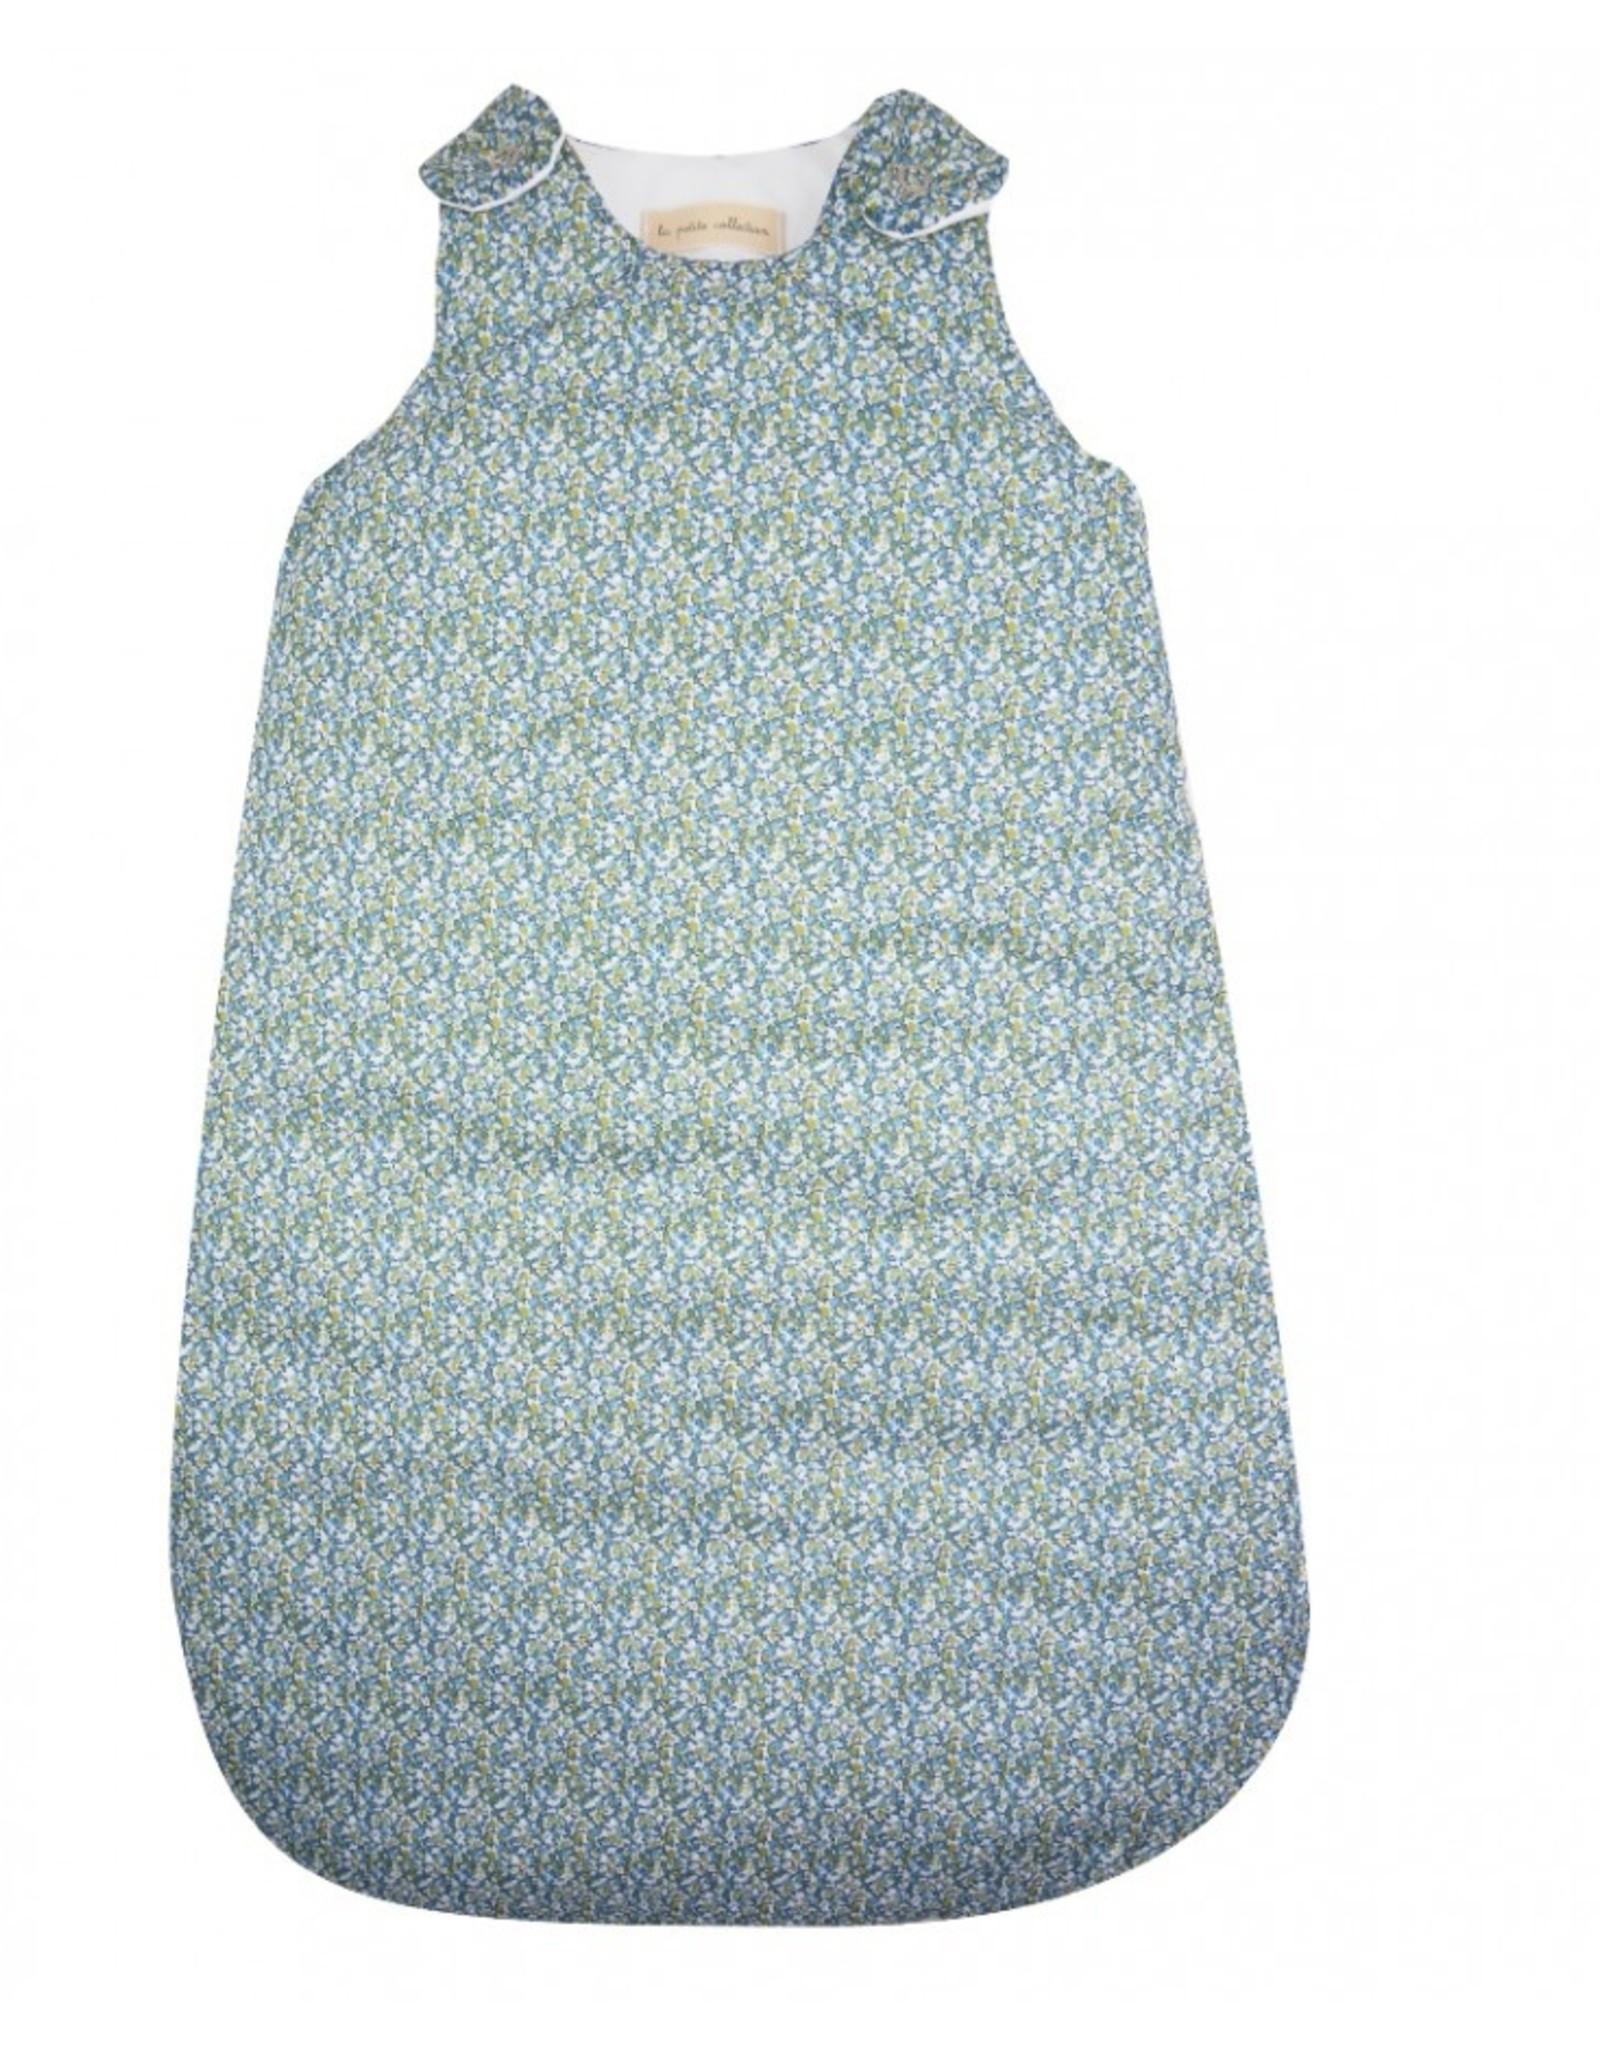 La Petite Collection Pepper Blue Sleeping Bag